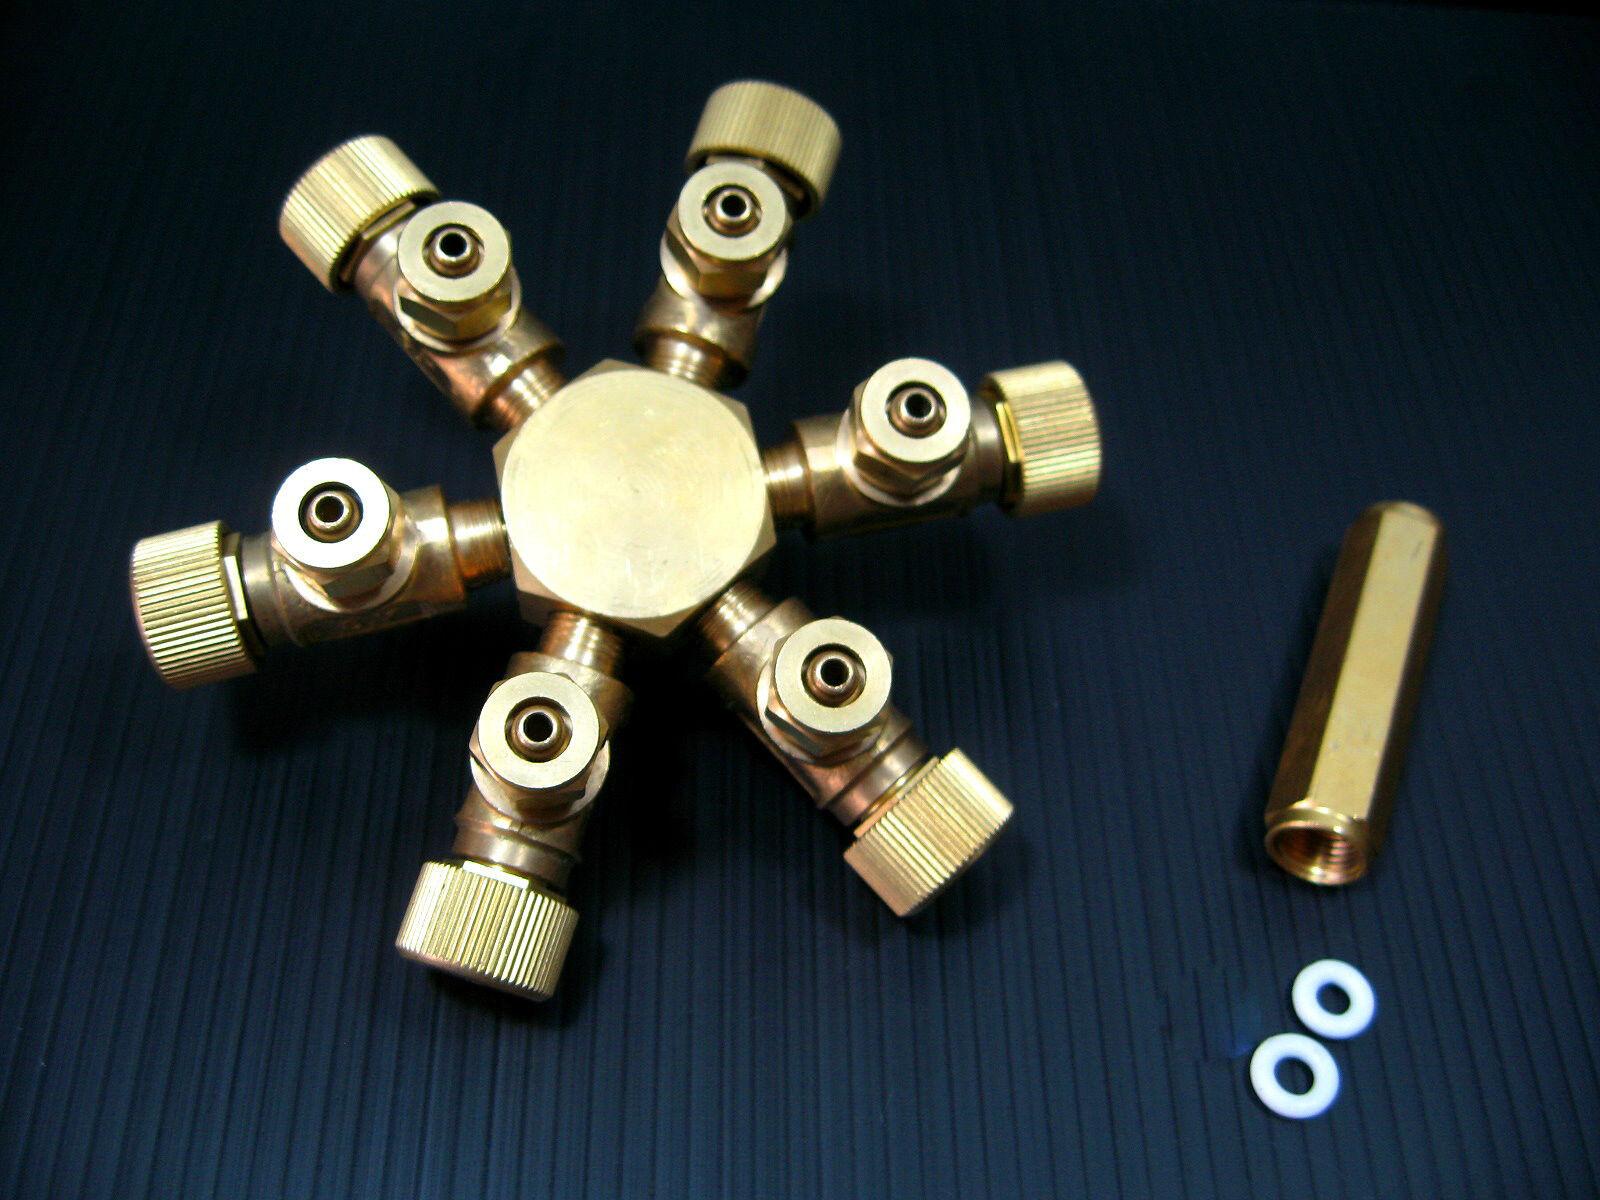 6 way Brass Co2 Splitter  Aquarium Regulator Solenoid Diffuser Tropical Fish ph